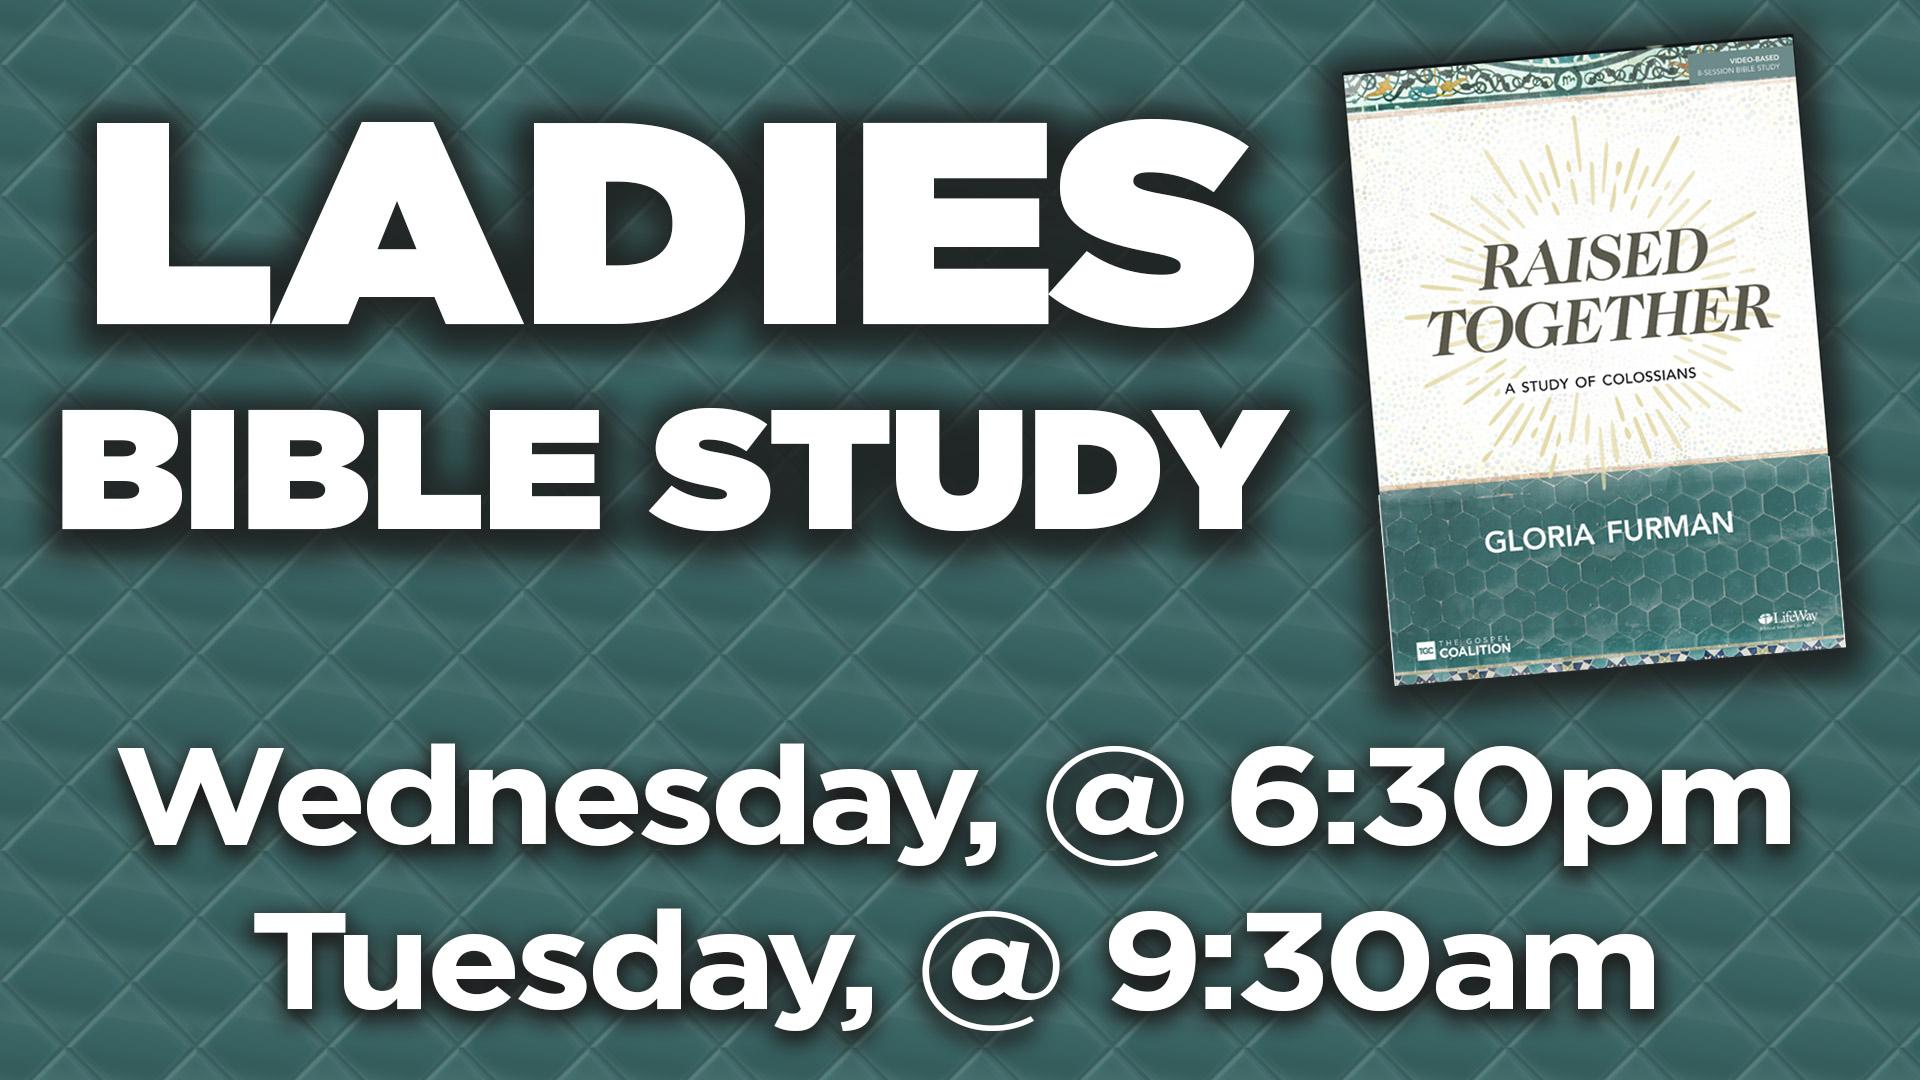 Ladies Bible Study - Seed